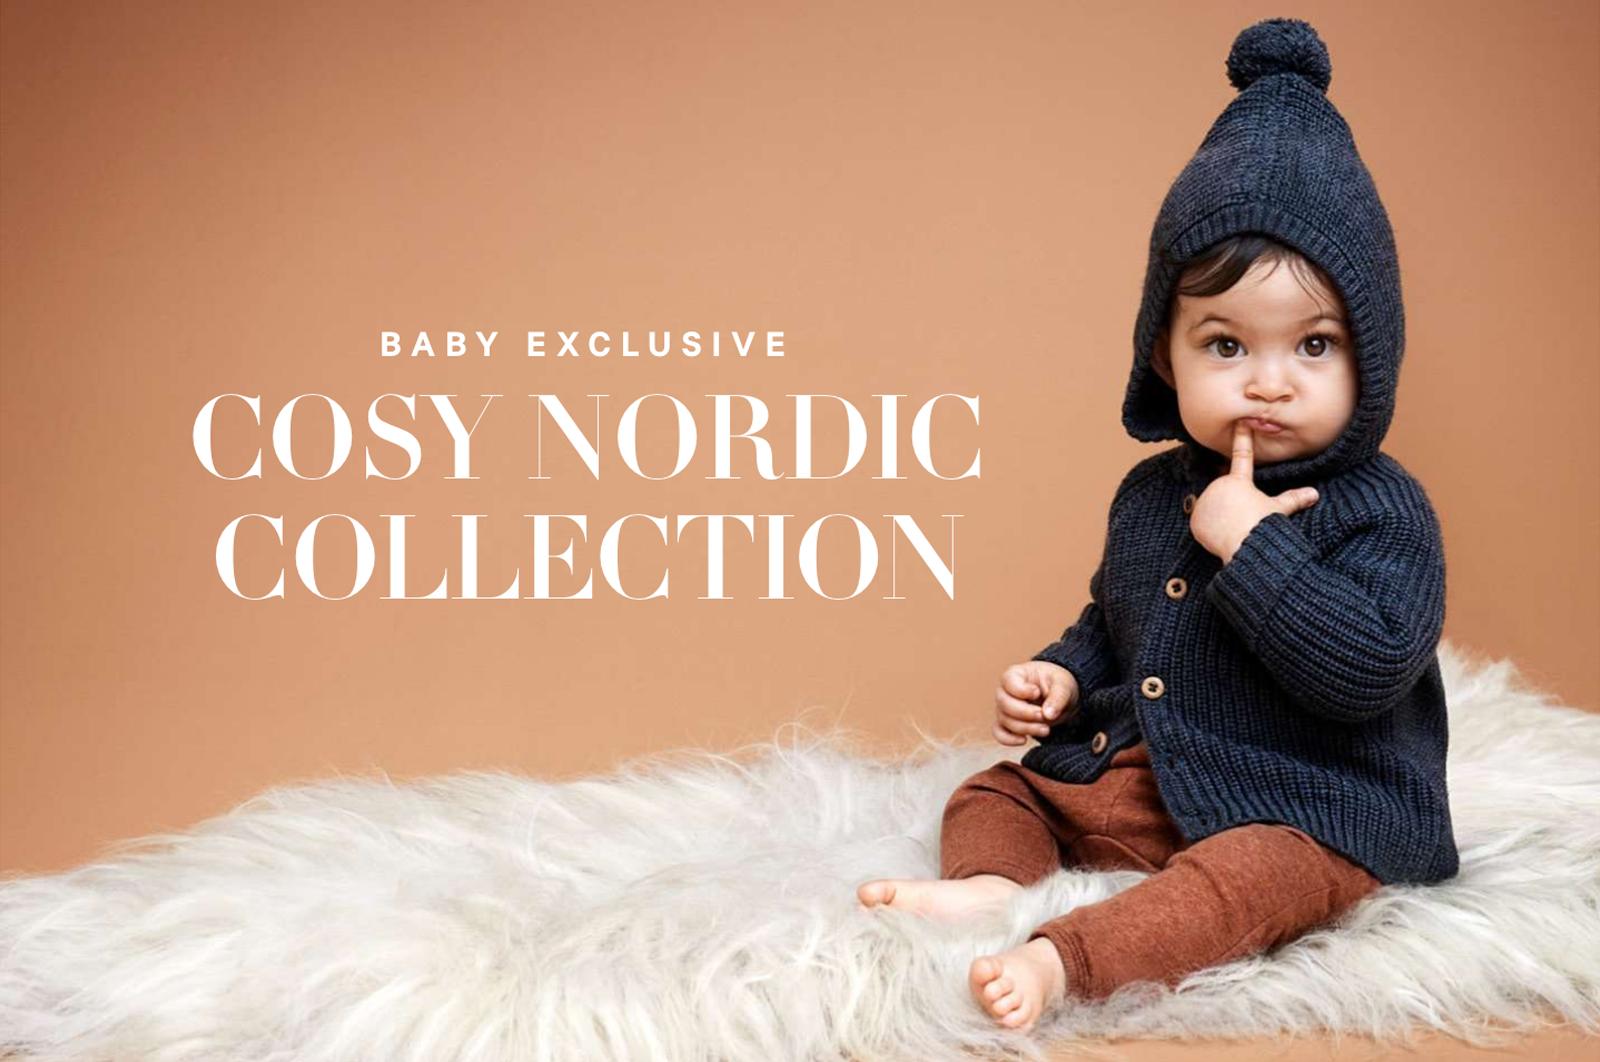 HM_baby_nordic_start.jpg